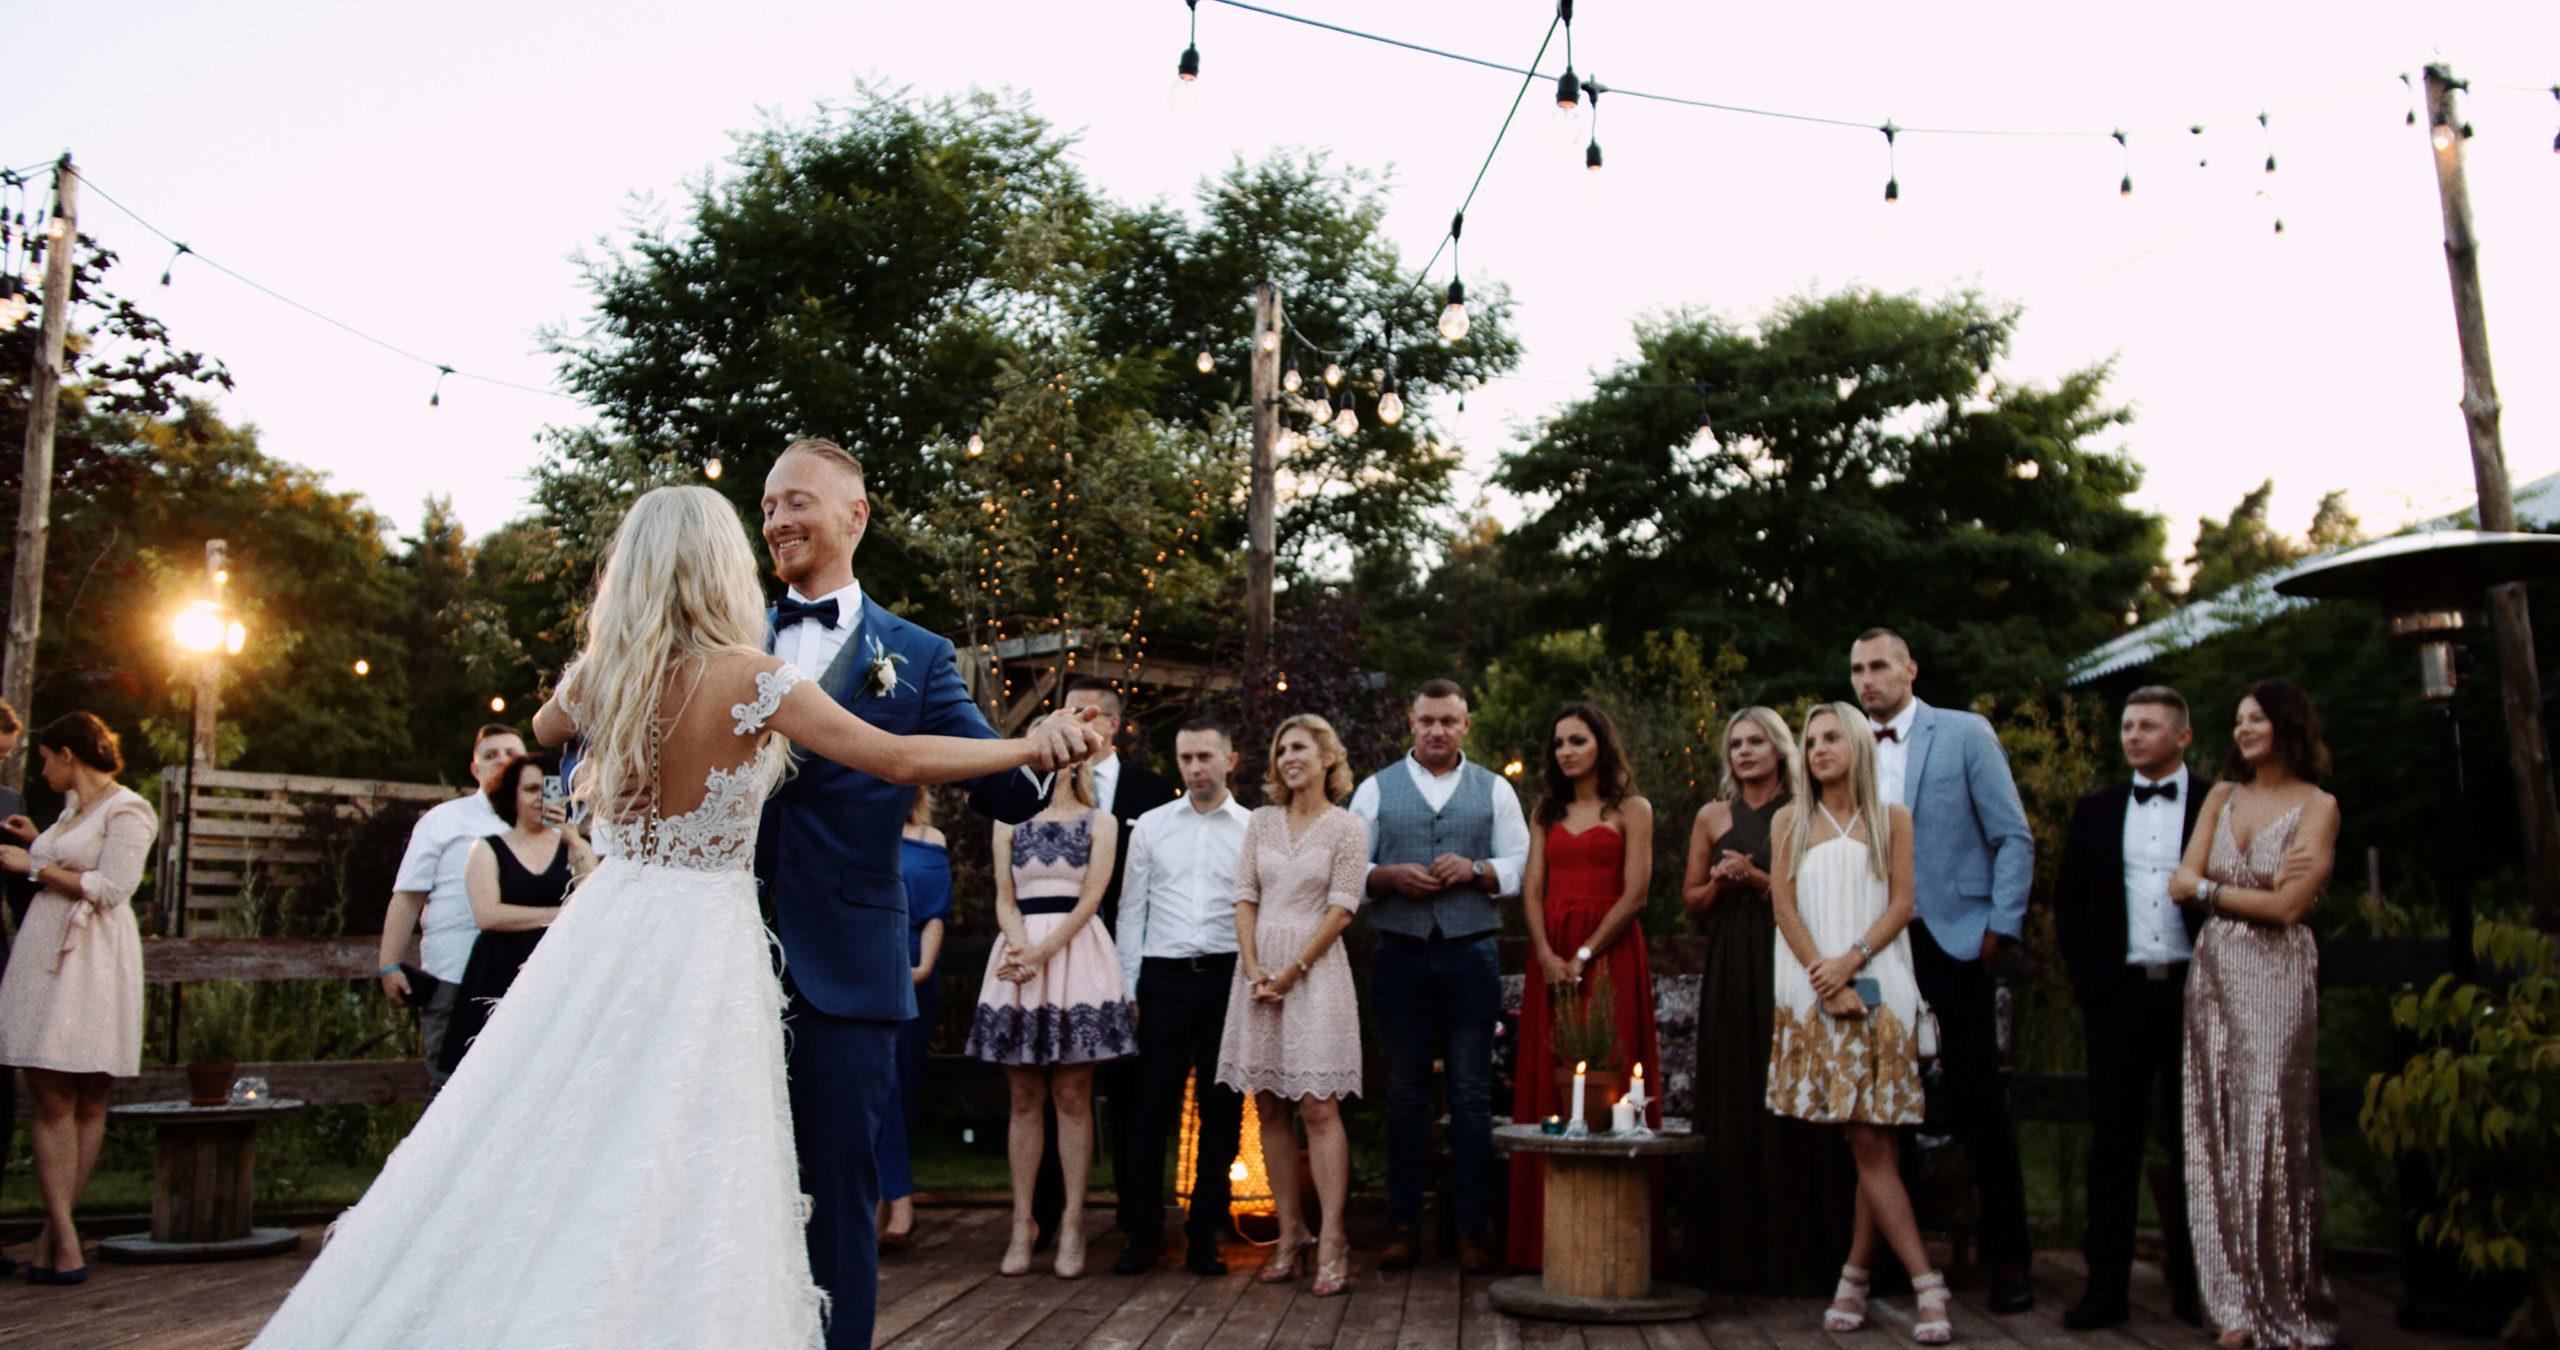 wesele w cicha 23